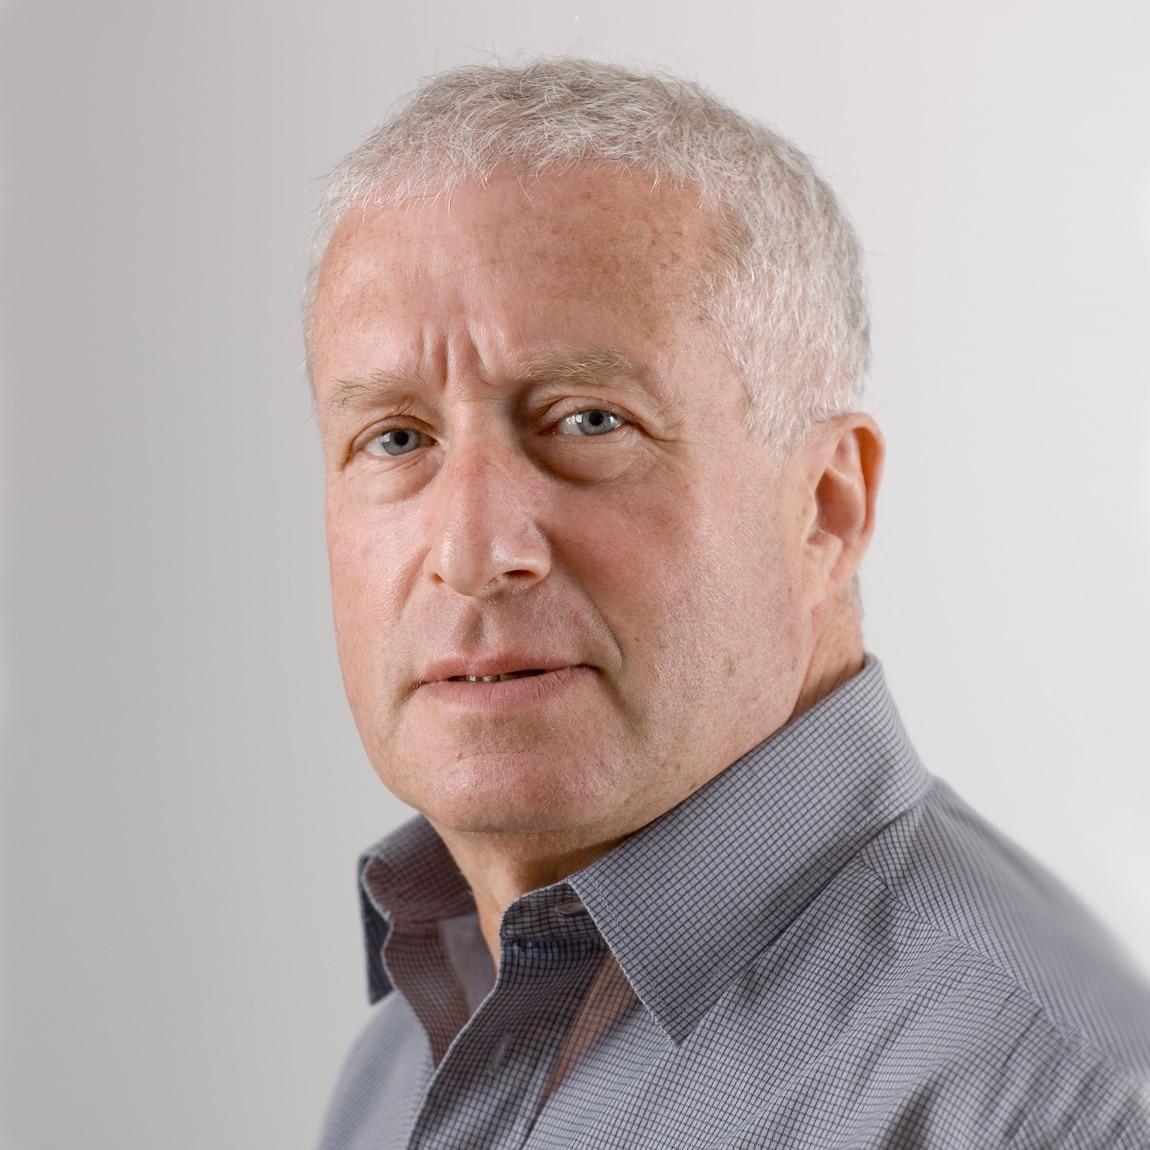 Vitali-Vitaliev-award-winning-Russian-Investigative-journalist-raconteur-speaker-at-Great-British-Speakers